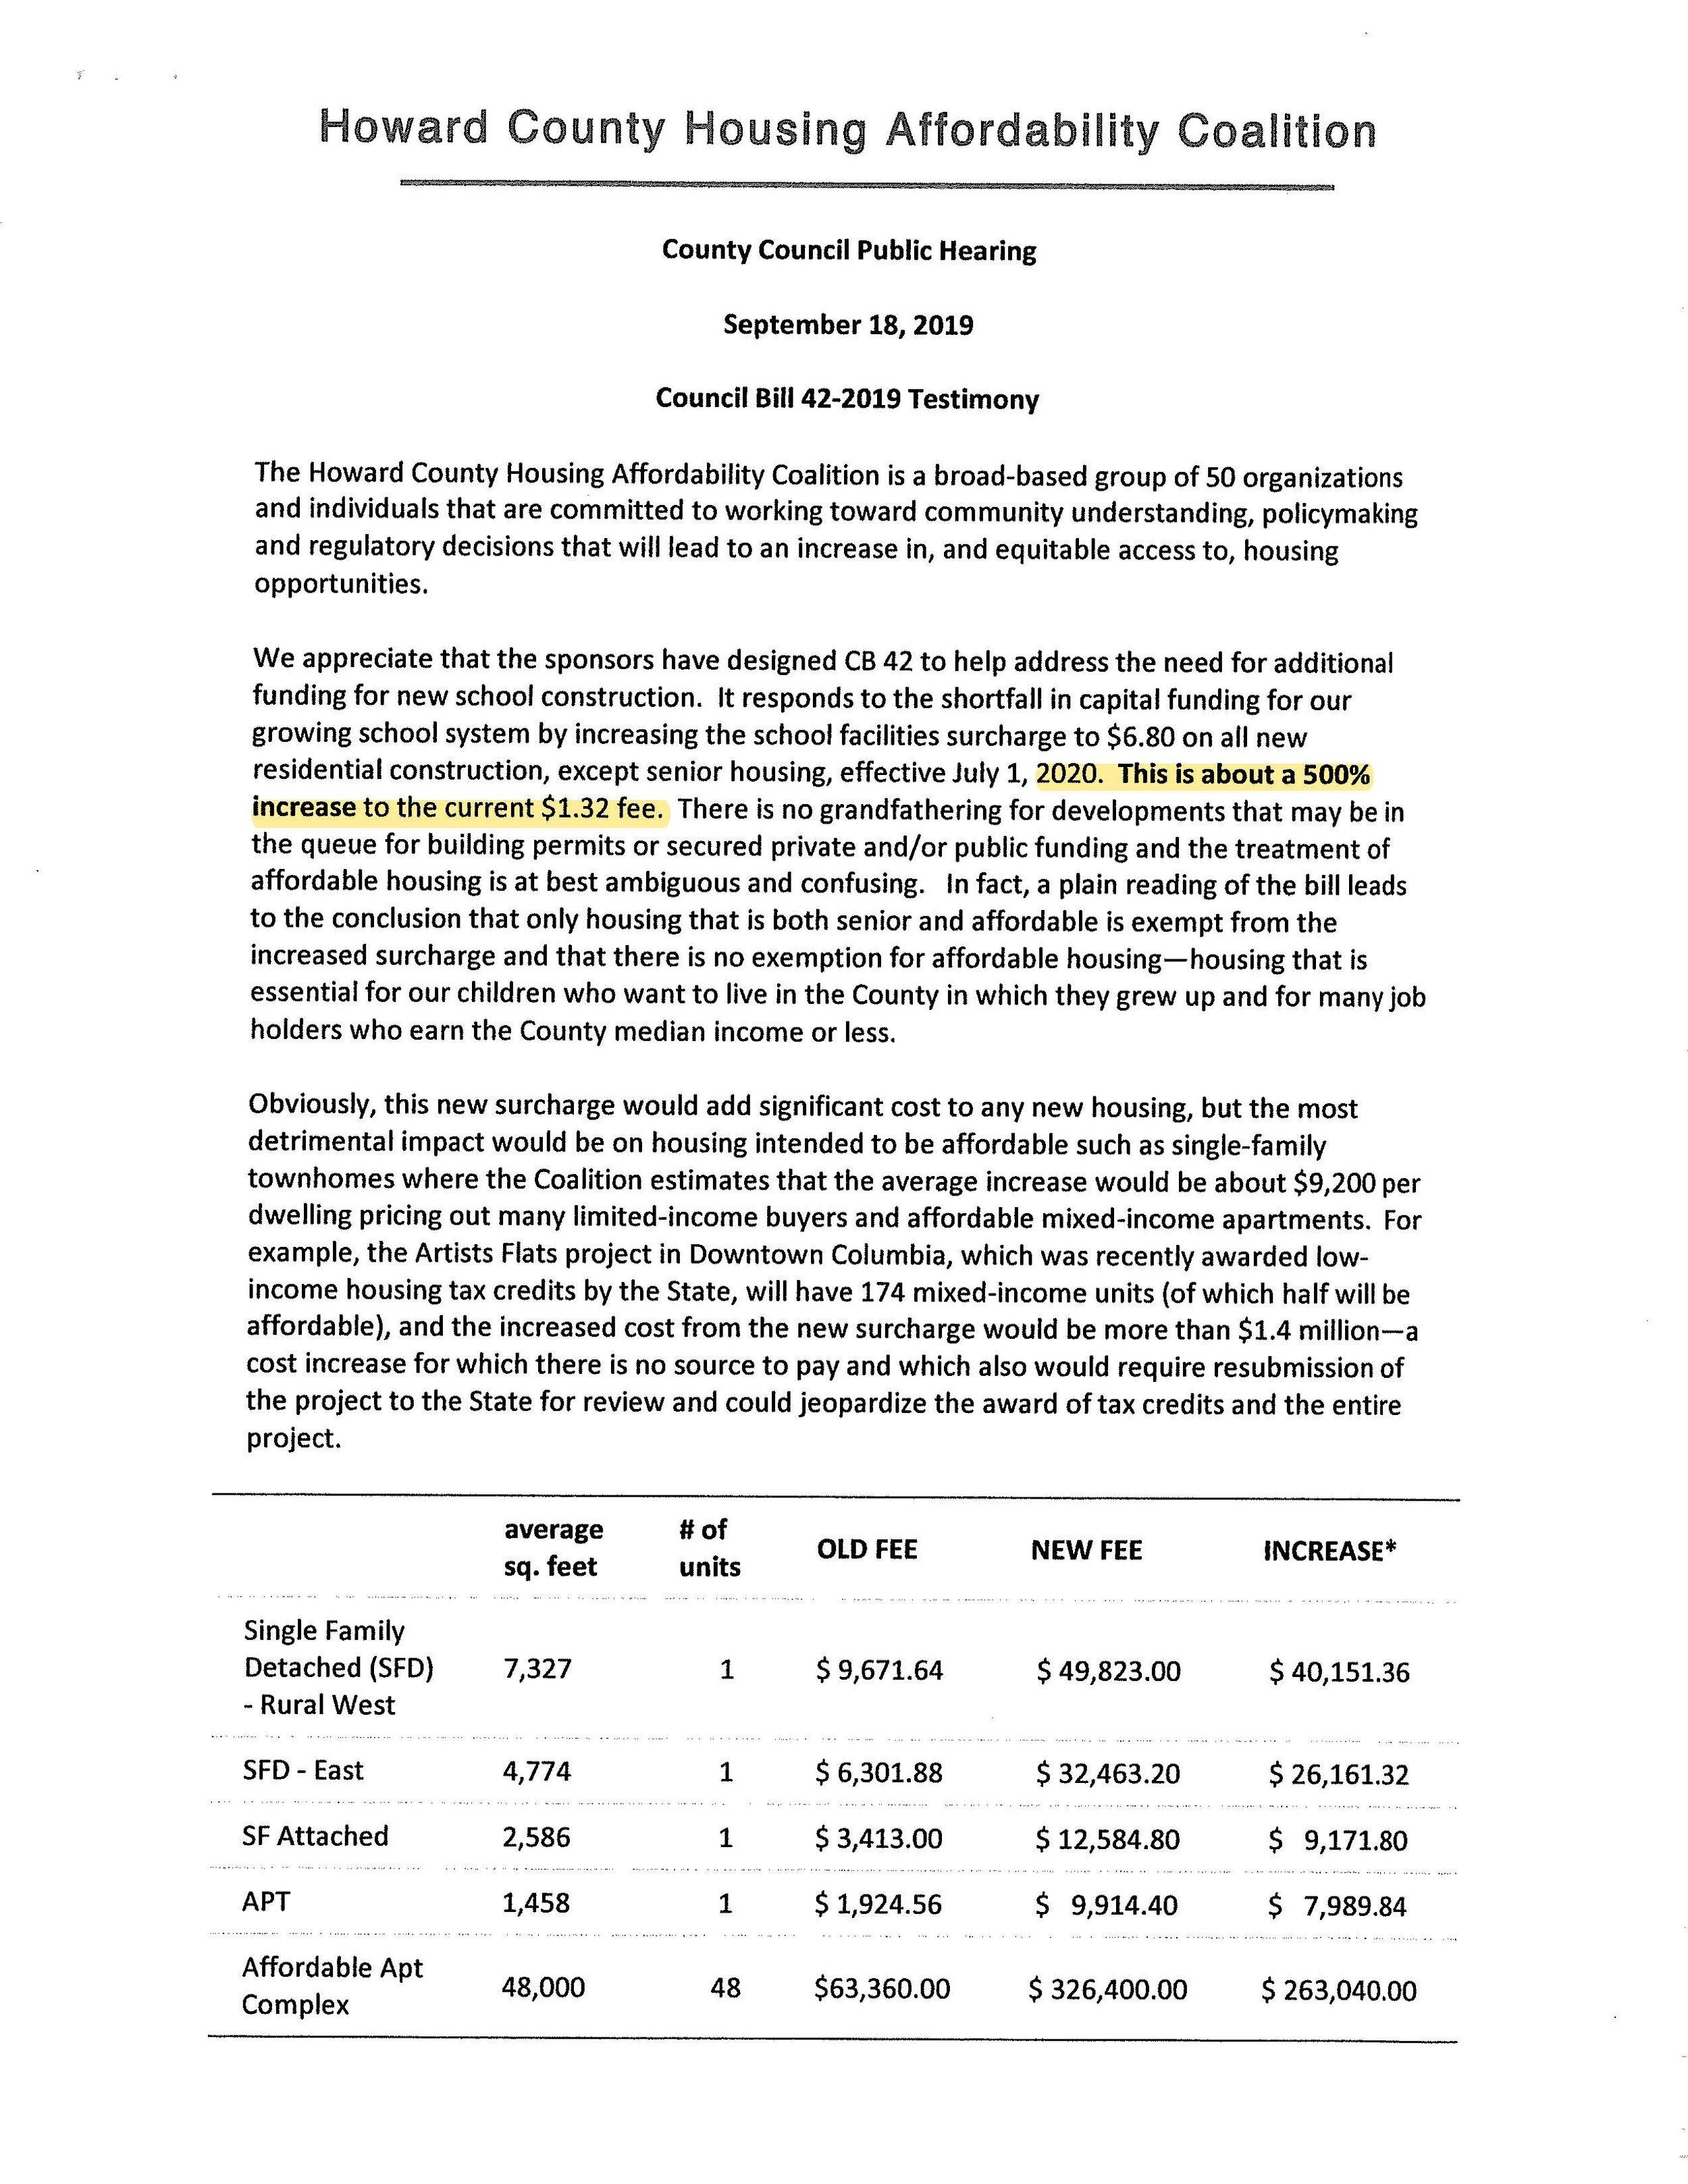 Howard County Housing Affordablity Coalition.jpg